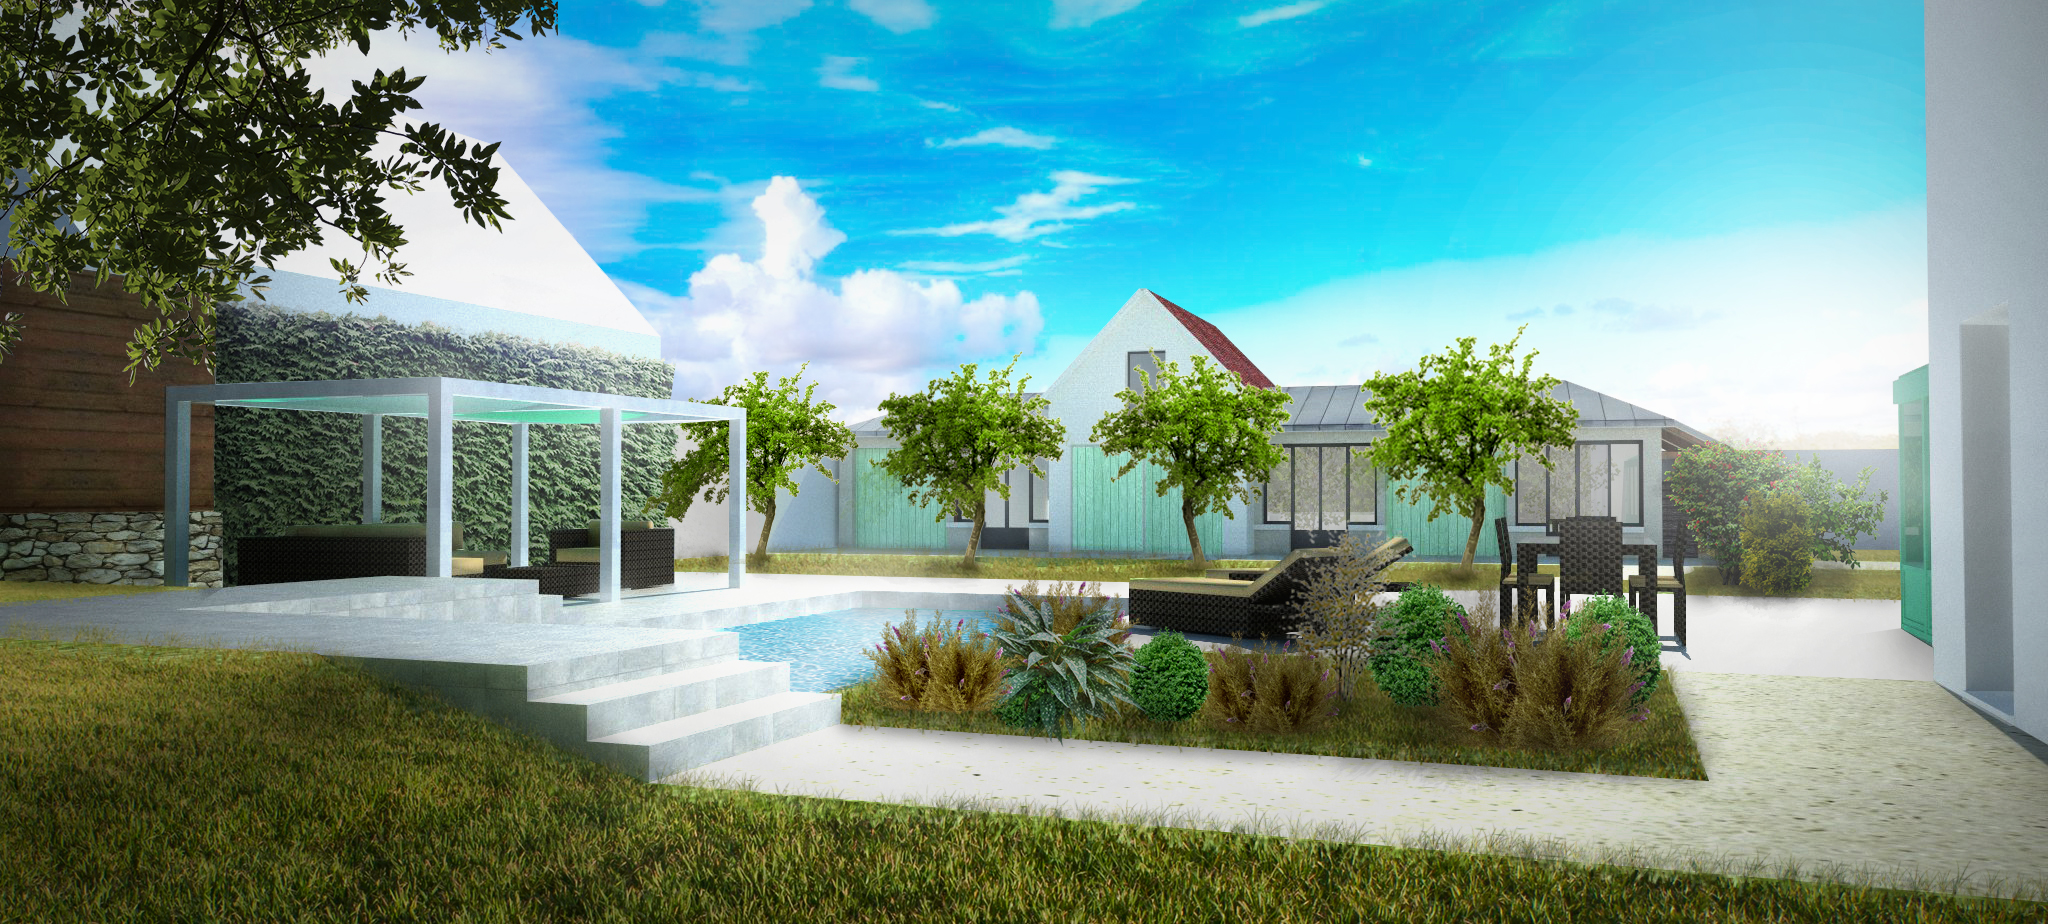 Mf architecture michel figea architecte for Jardin grisy les platres